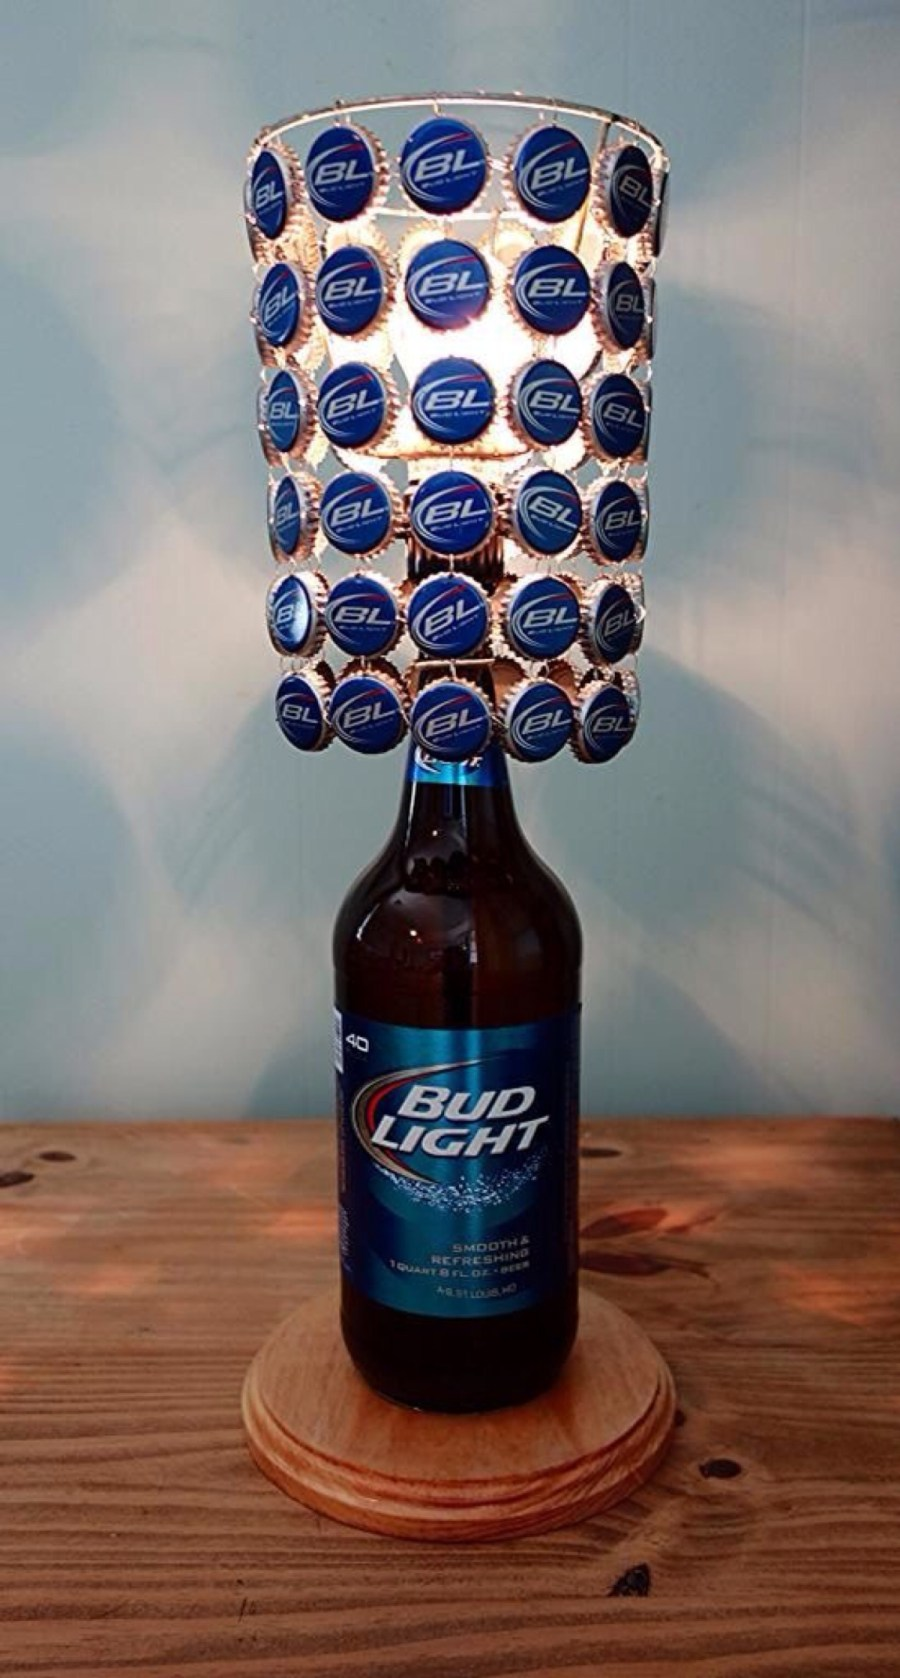 AD-Creative-DIY-Bottle-Lamps-Decor-Ideas-20